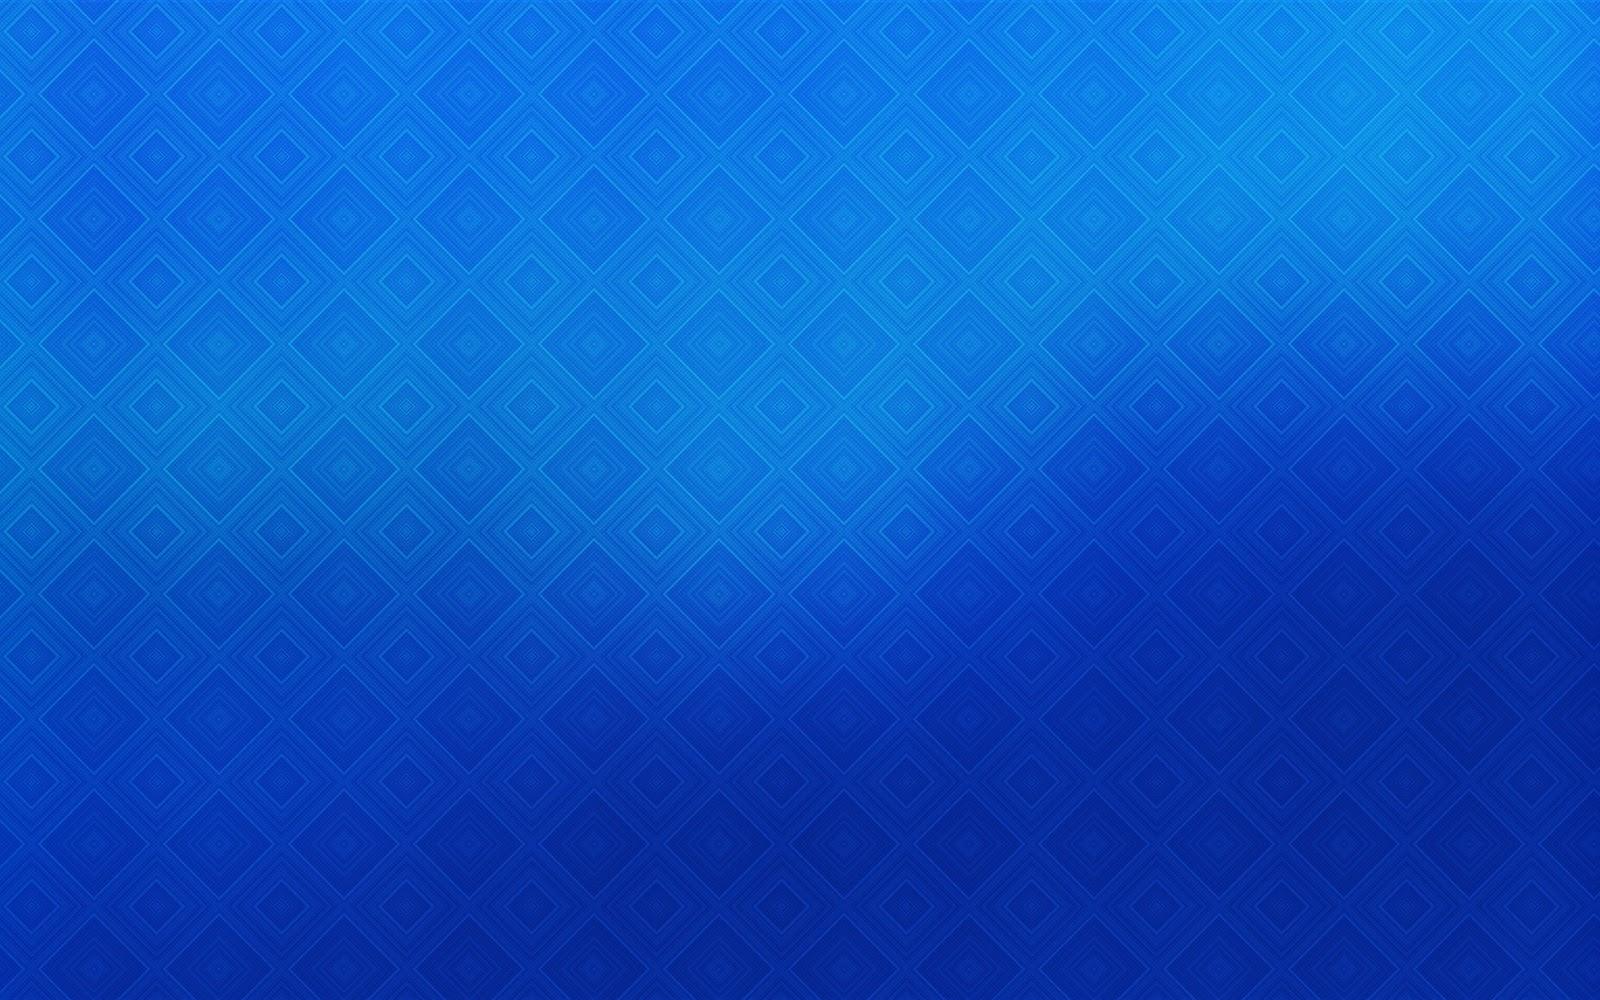 Smiley Full Hd Wallpaper And Achtergrond: Blauwe Achtergronden